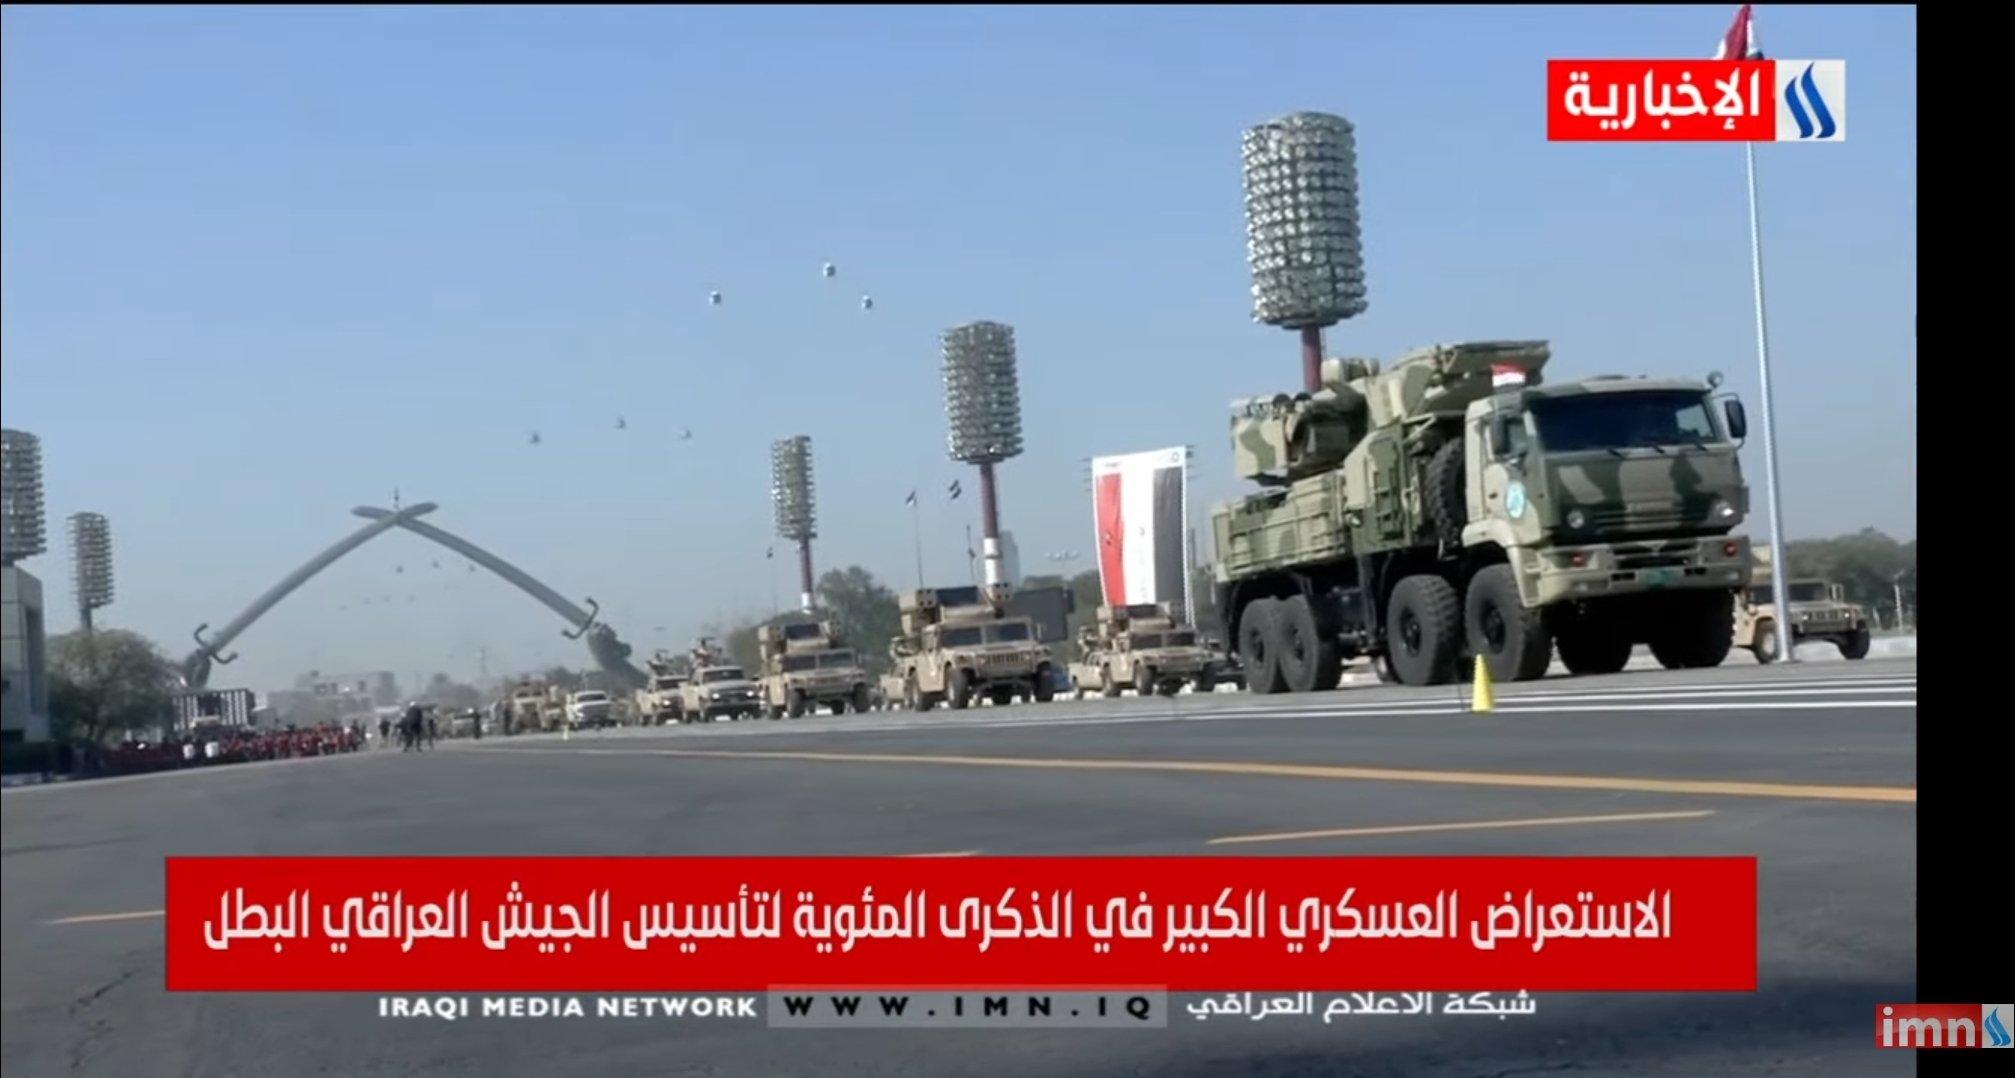 Armée Irakienne / Iraqi Armed Forces - Page 38 ErHx07-W8AIFEB-?format=jpg&name=large